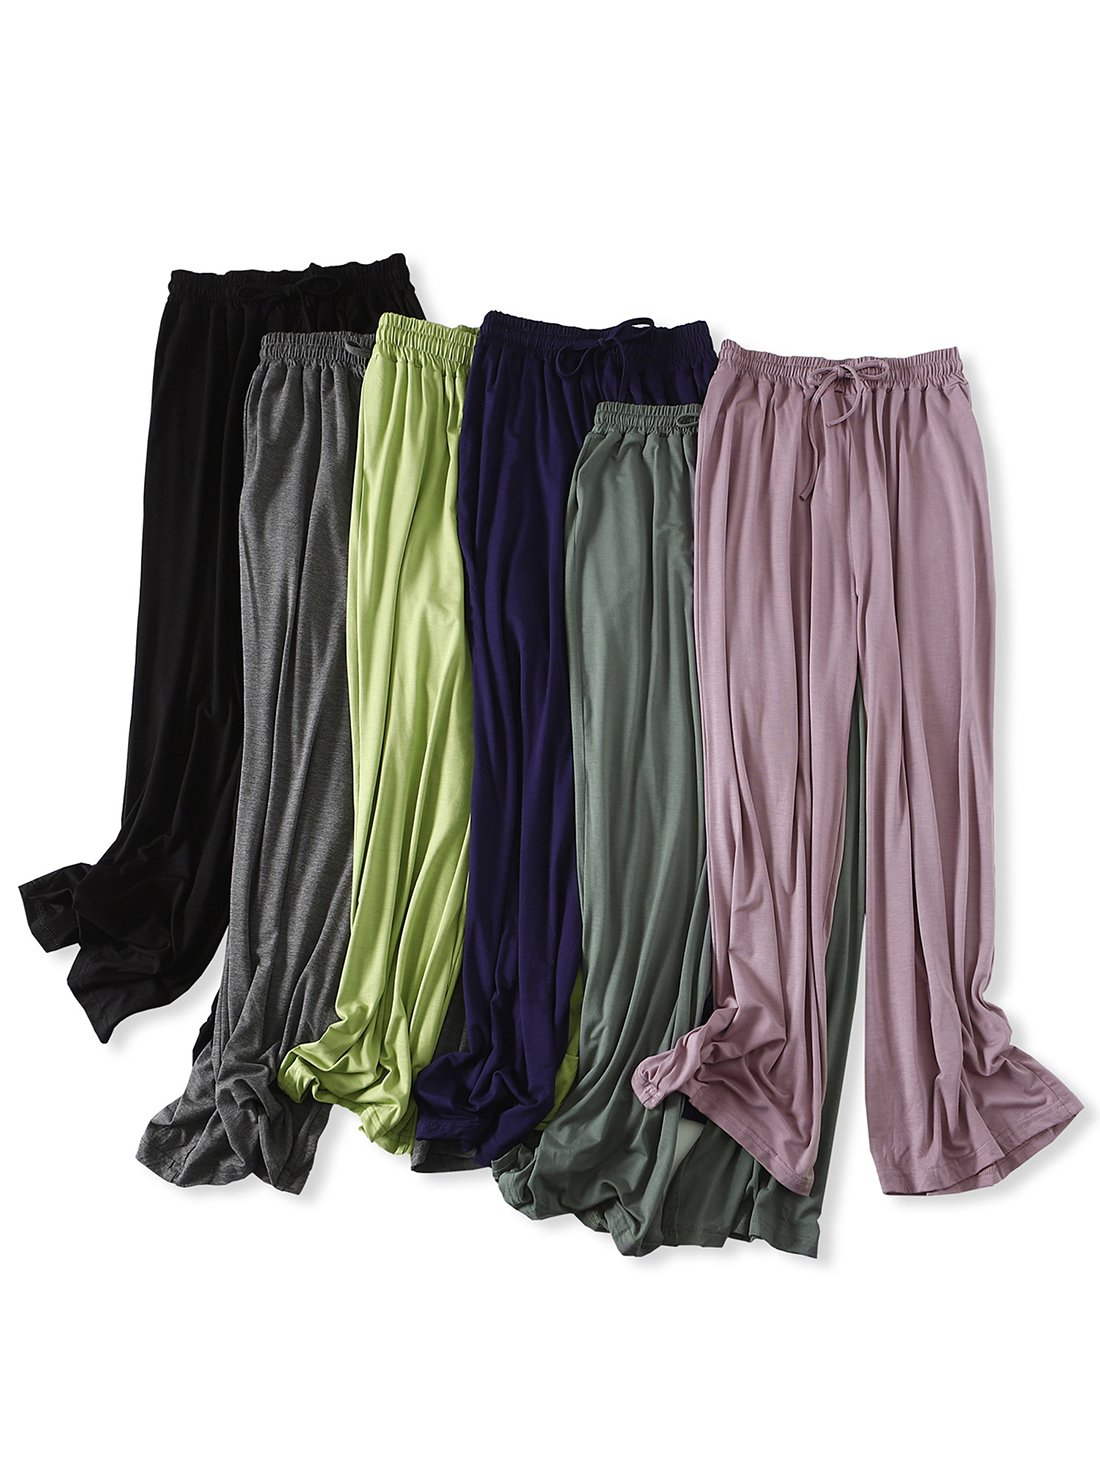 Women's Wide-leg Pants Modal Slimming